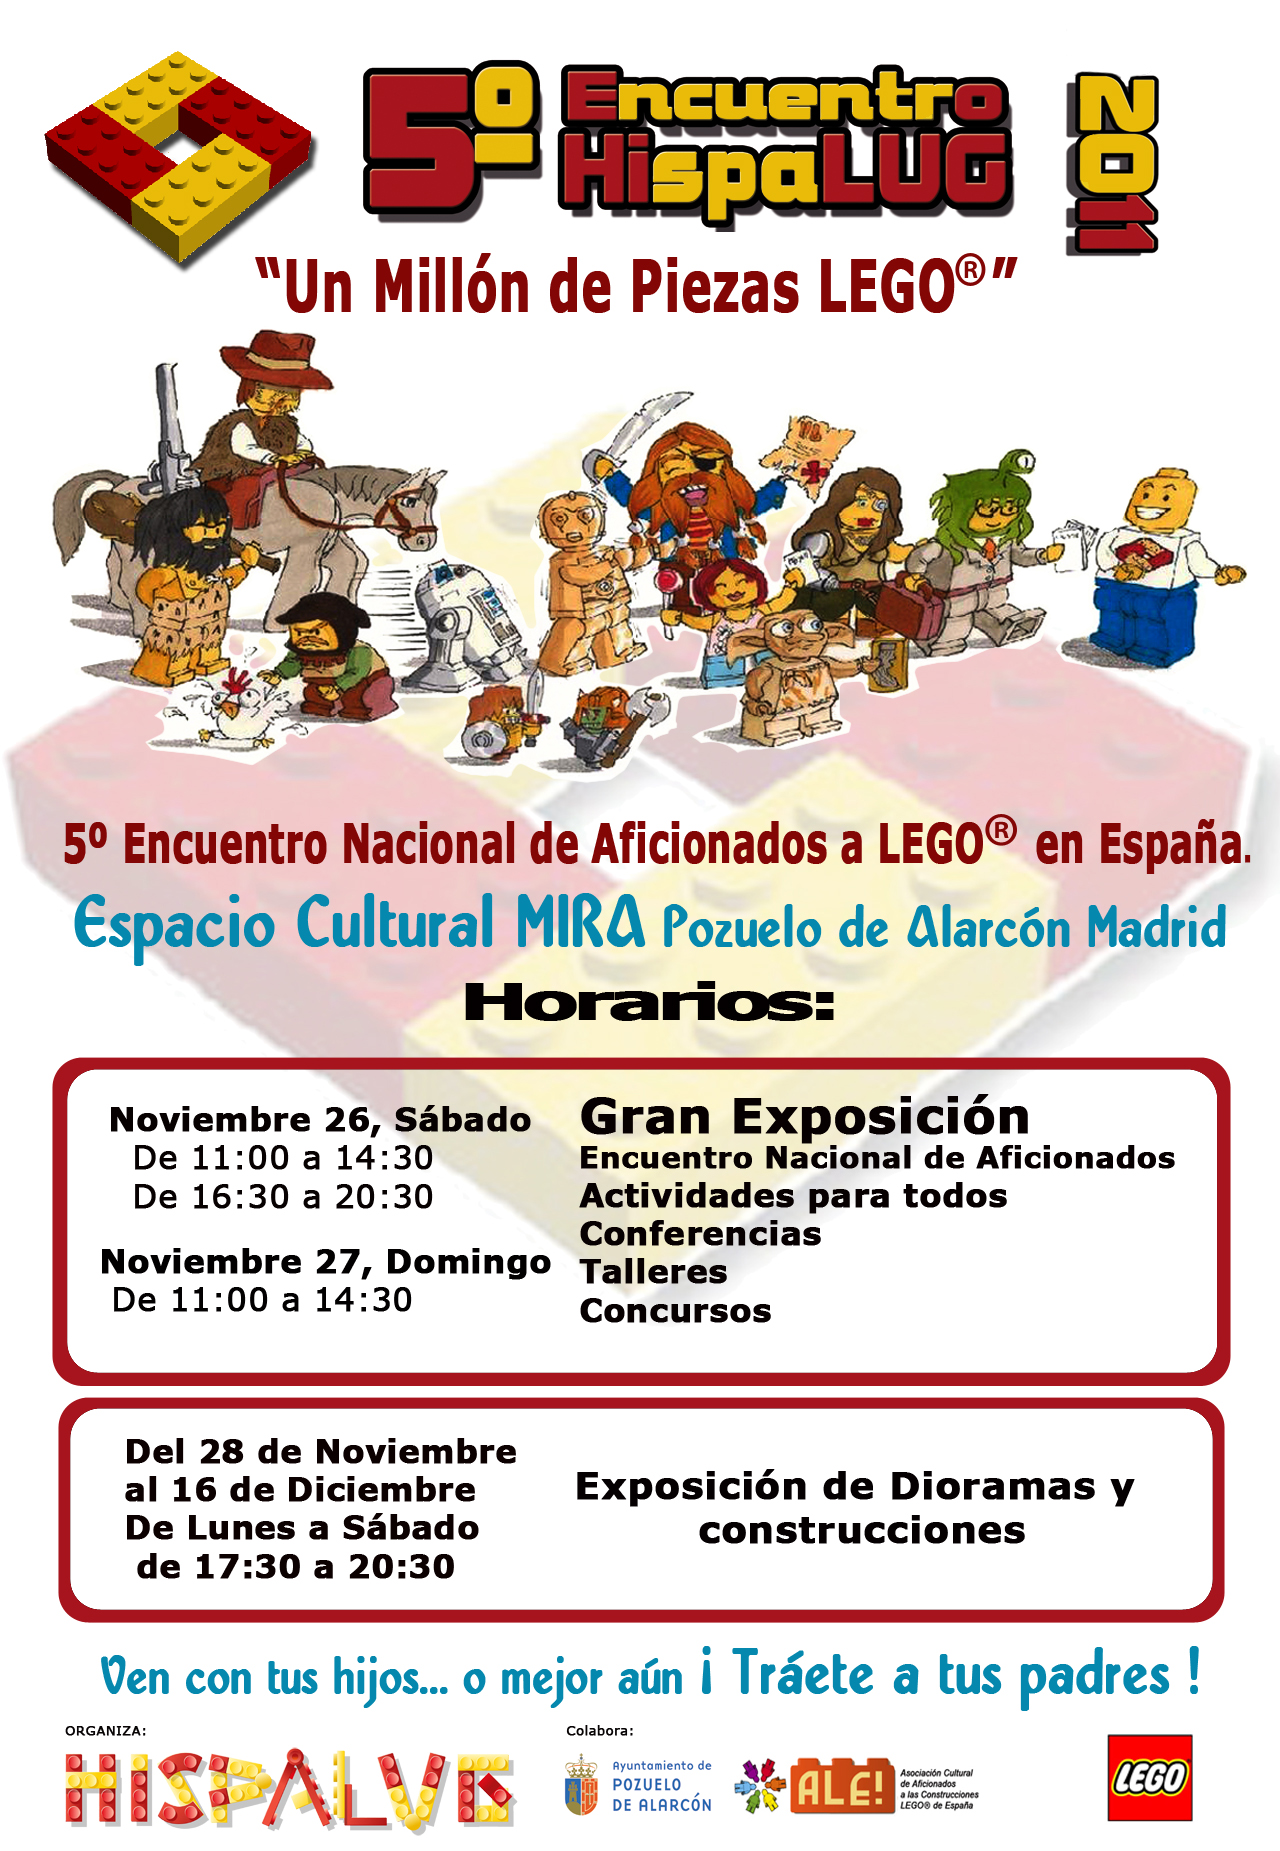 5º Encuentro HispaLUG